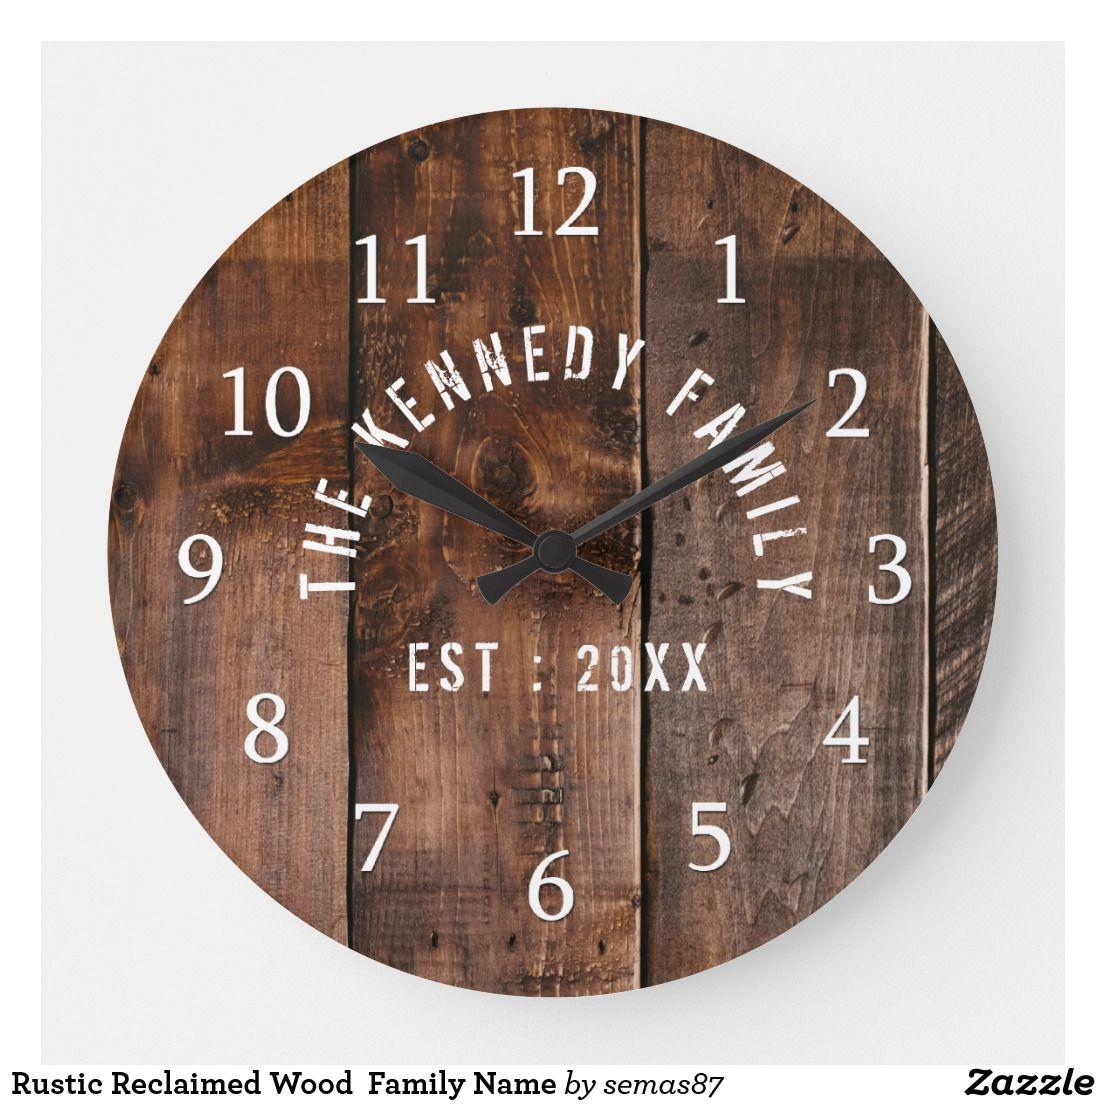 Rustic Reclaimed Wood Family Name Large Clock Zazzle Com Rustic Reclaimed Wood Rustic Wall Clocks Large Clock